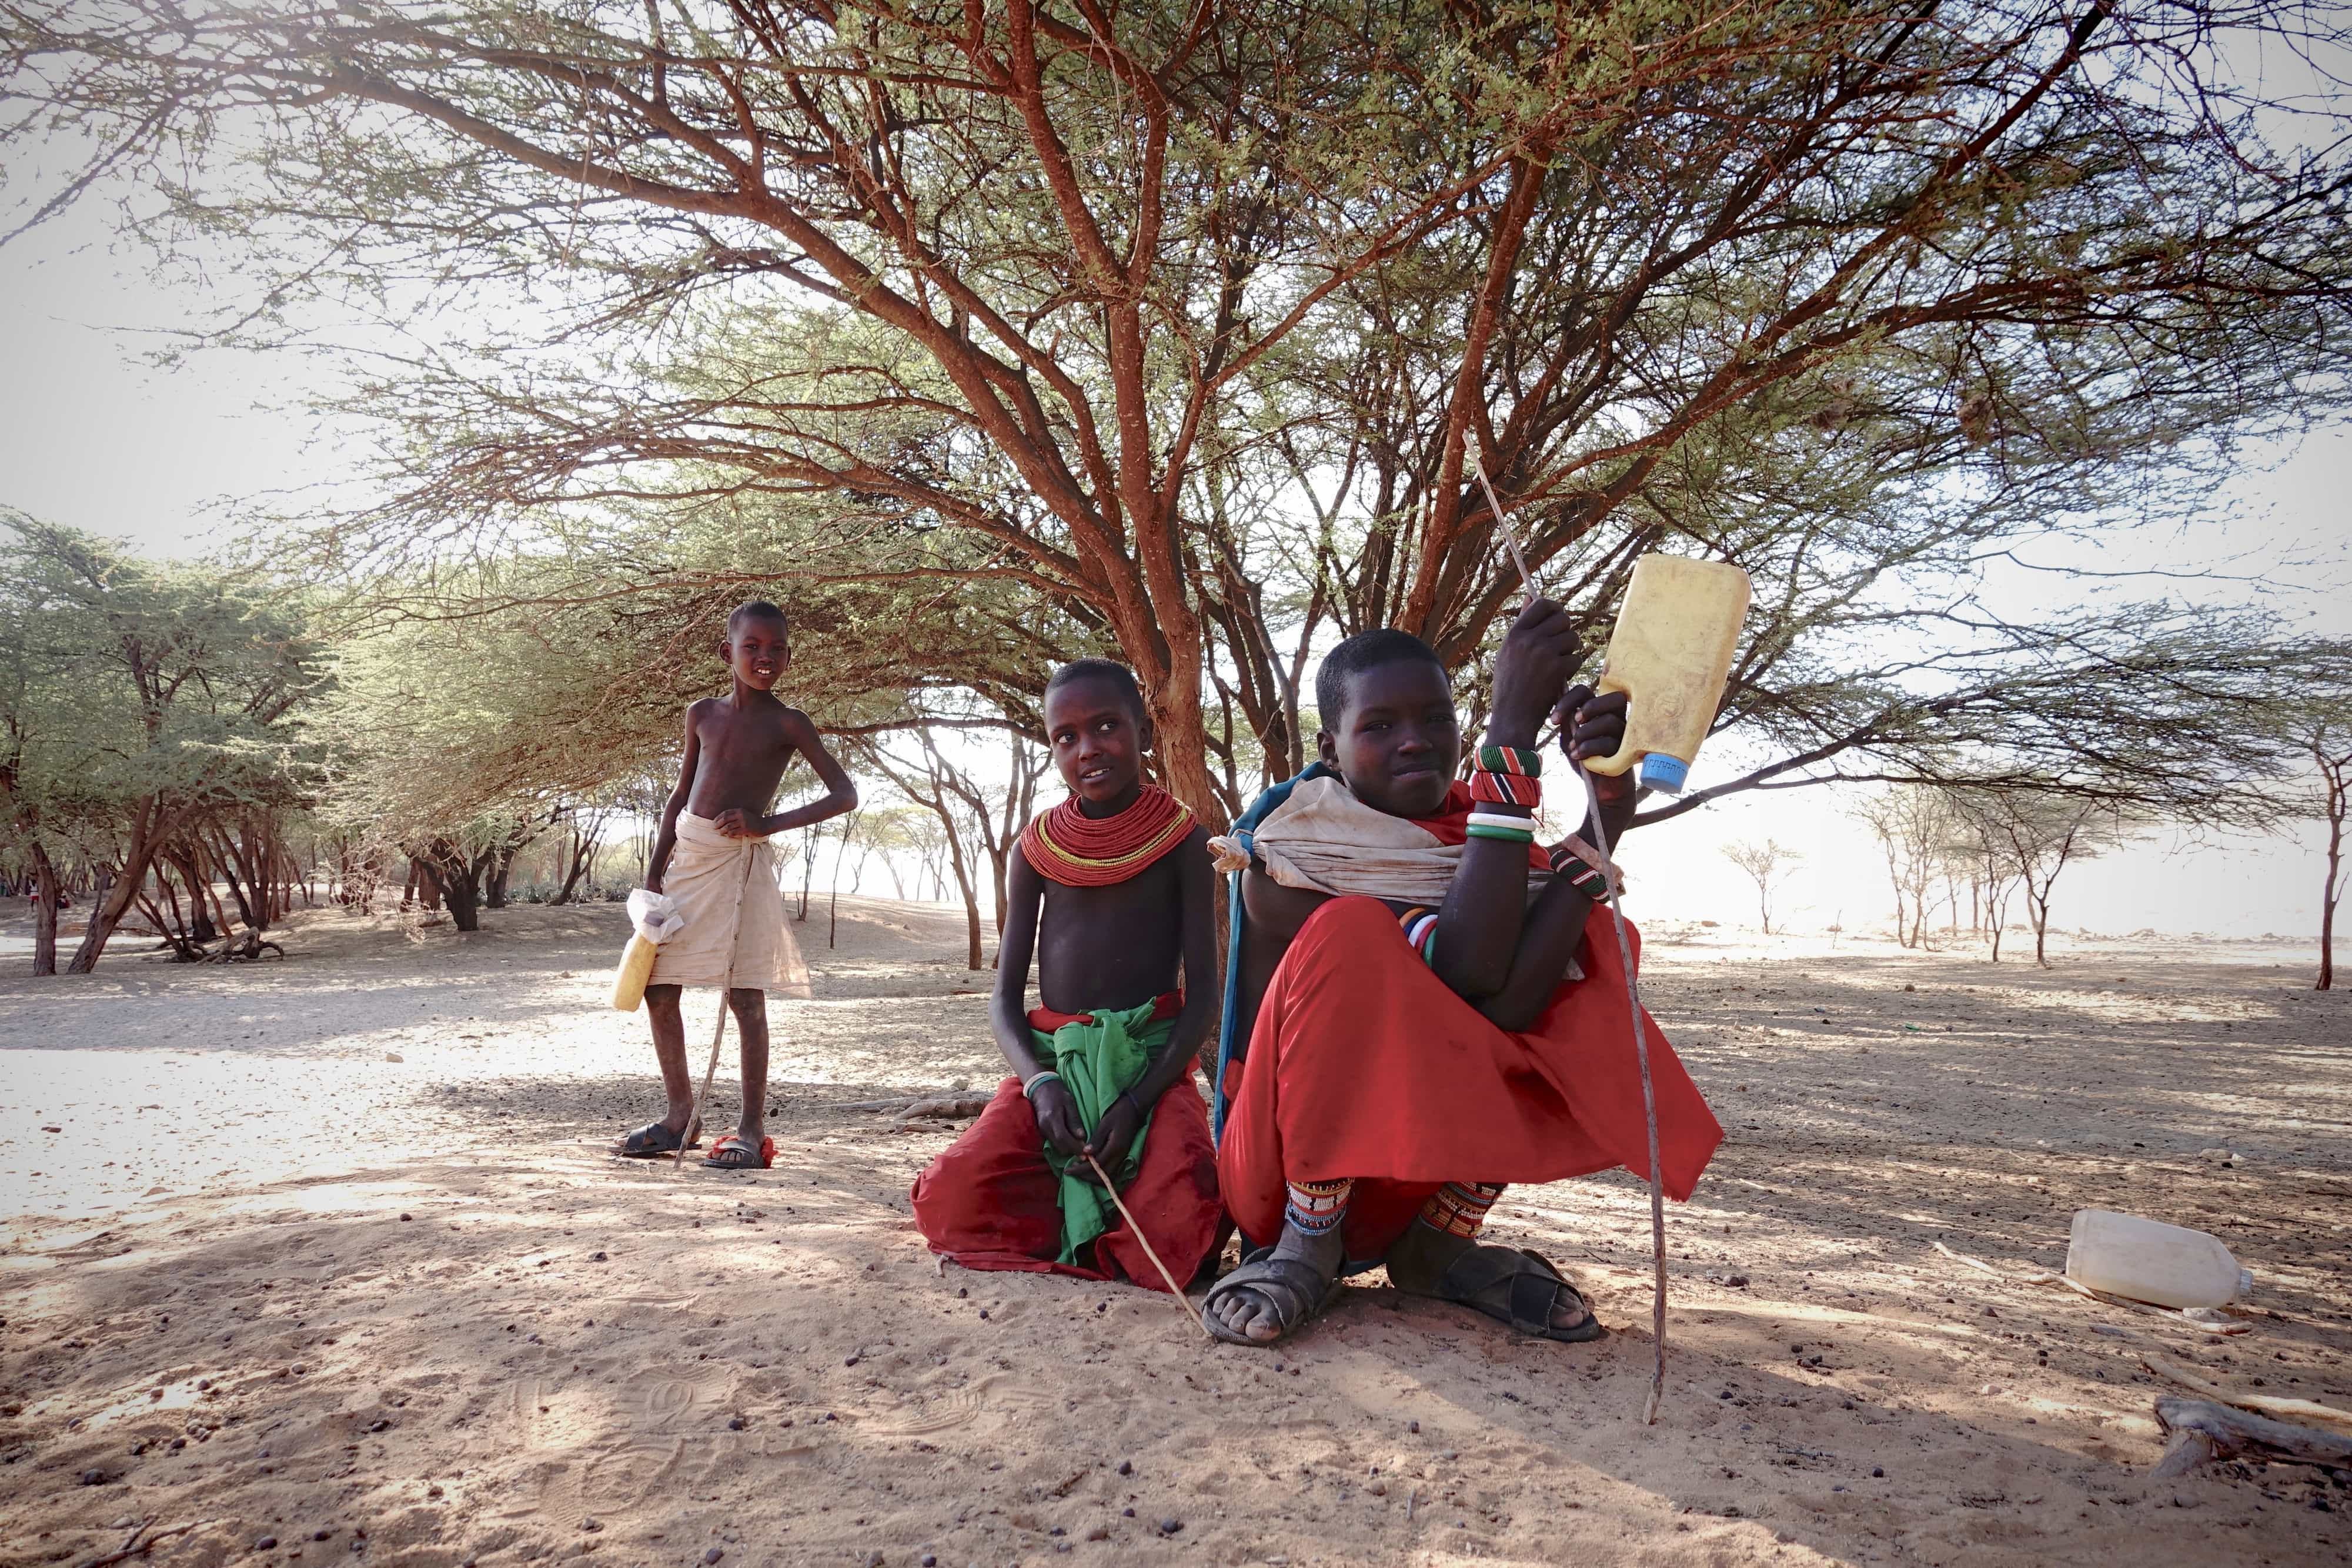 Turkana-børn driver deres geder til brønden. Foto: Shafiur Rahman, Danwatch.